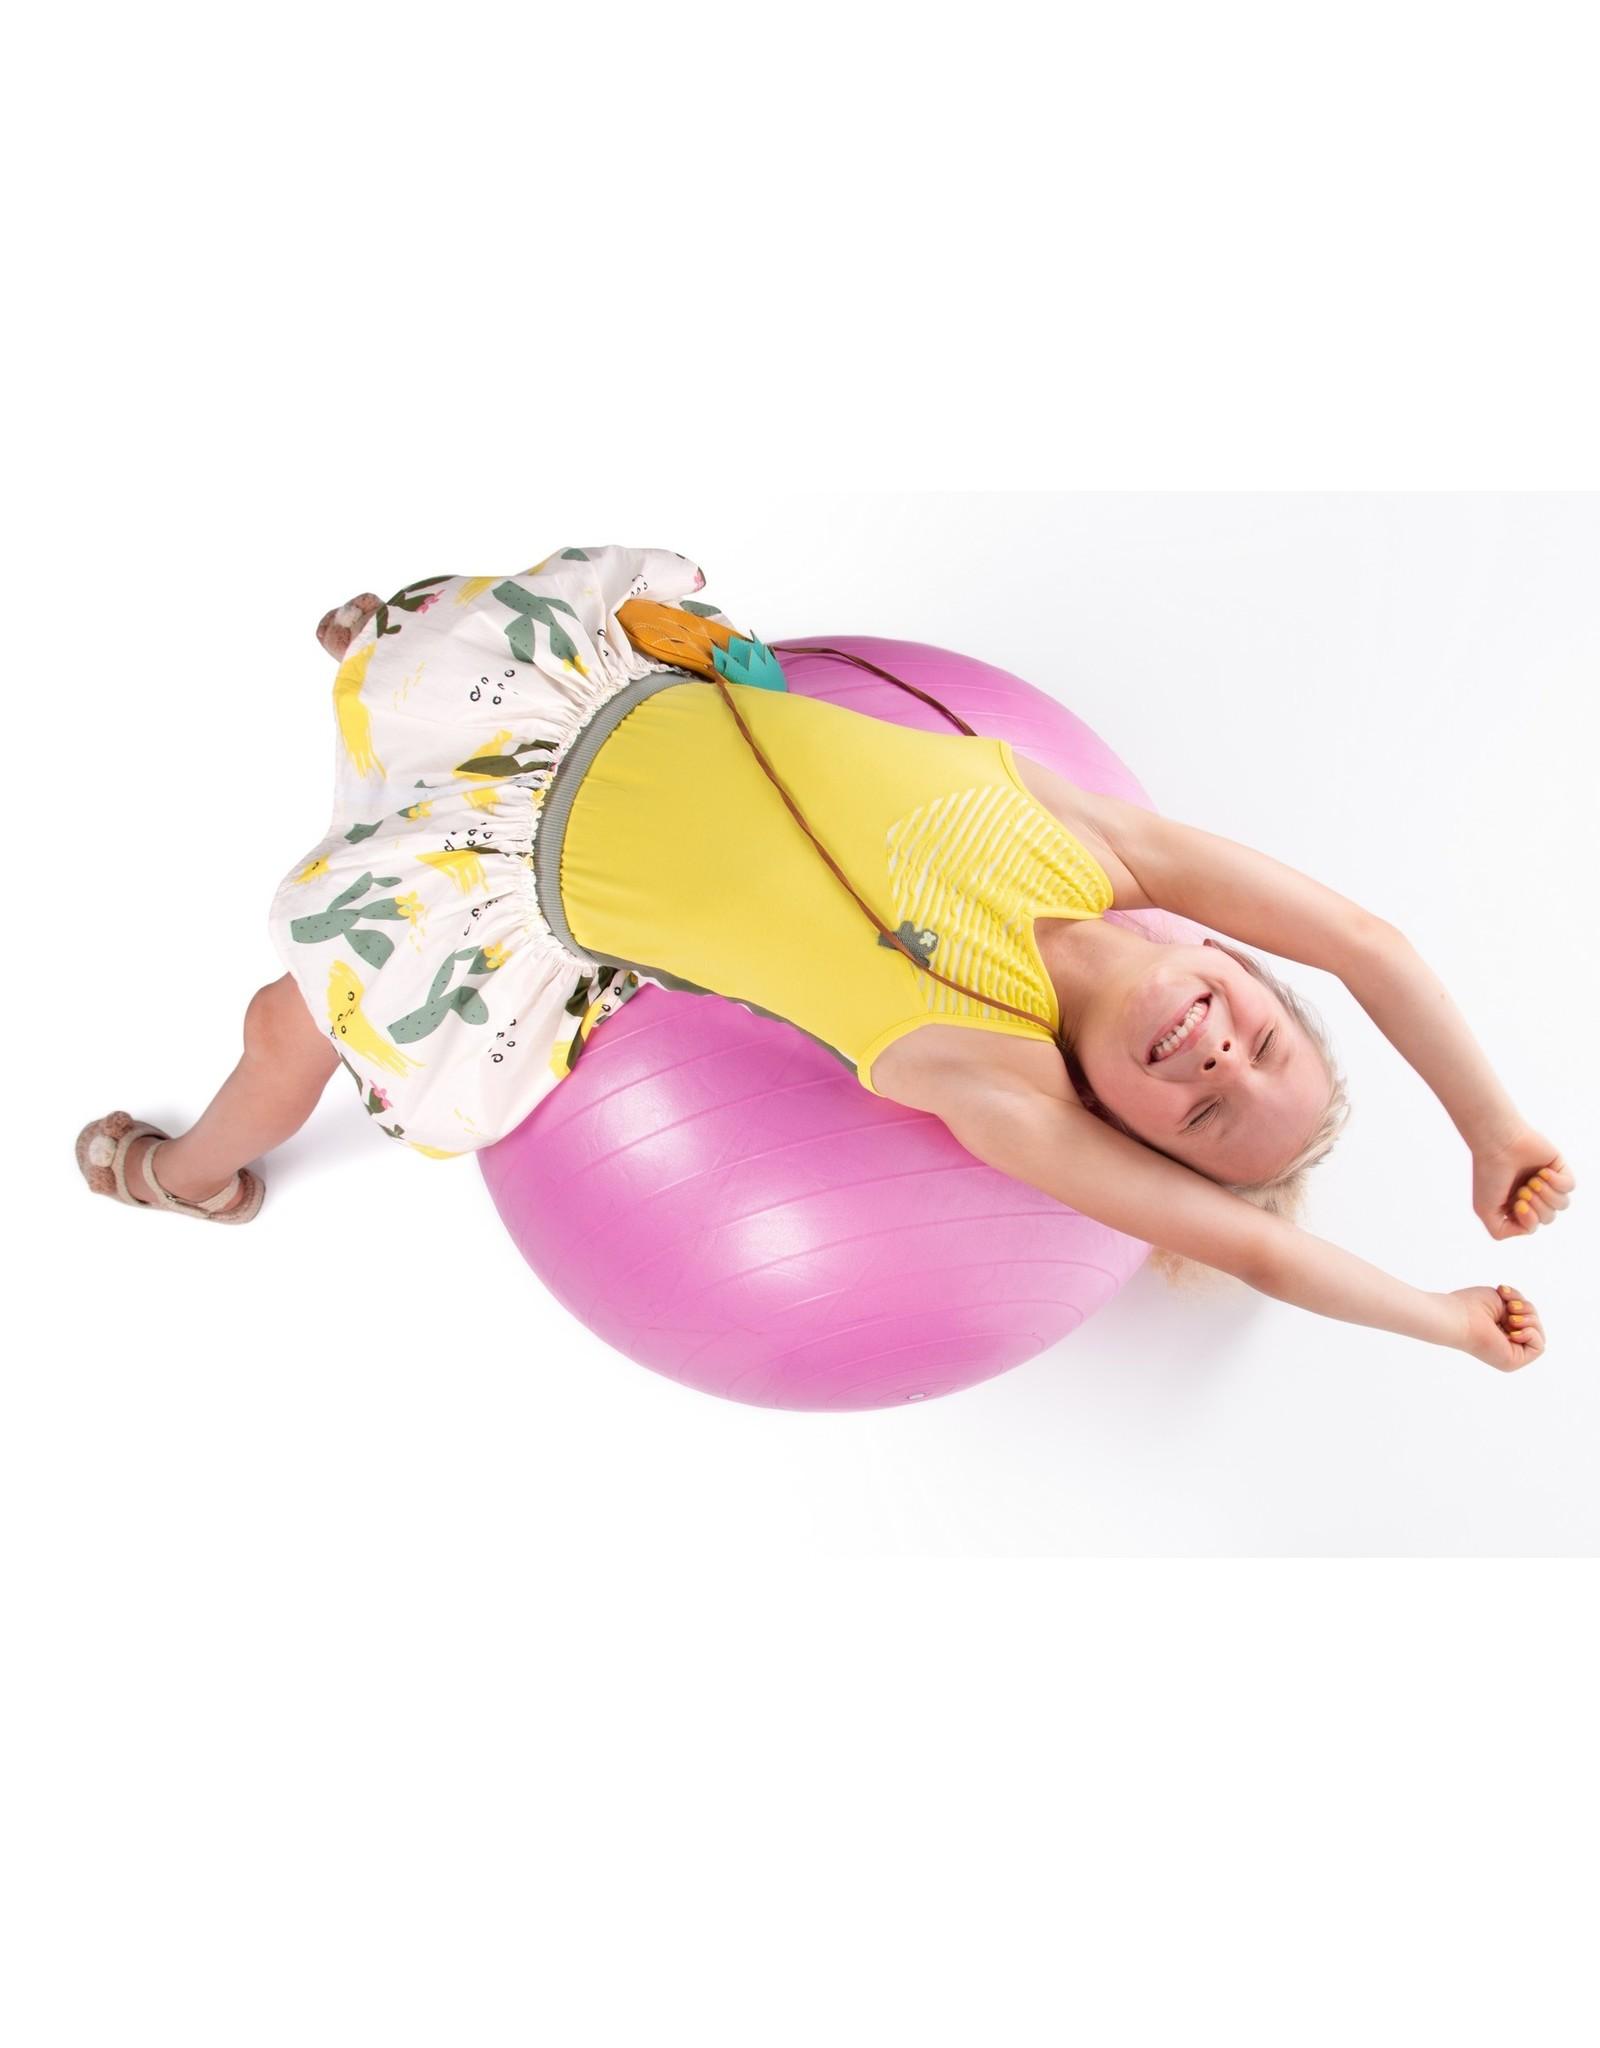 NONO NONO Nana reversible Skirt Lemon / Cactus All over